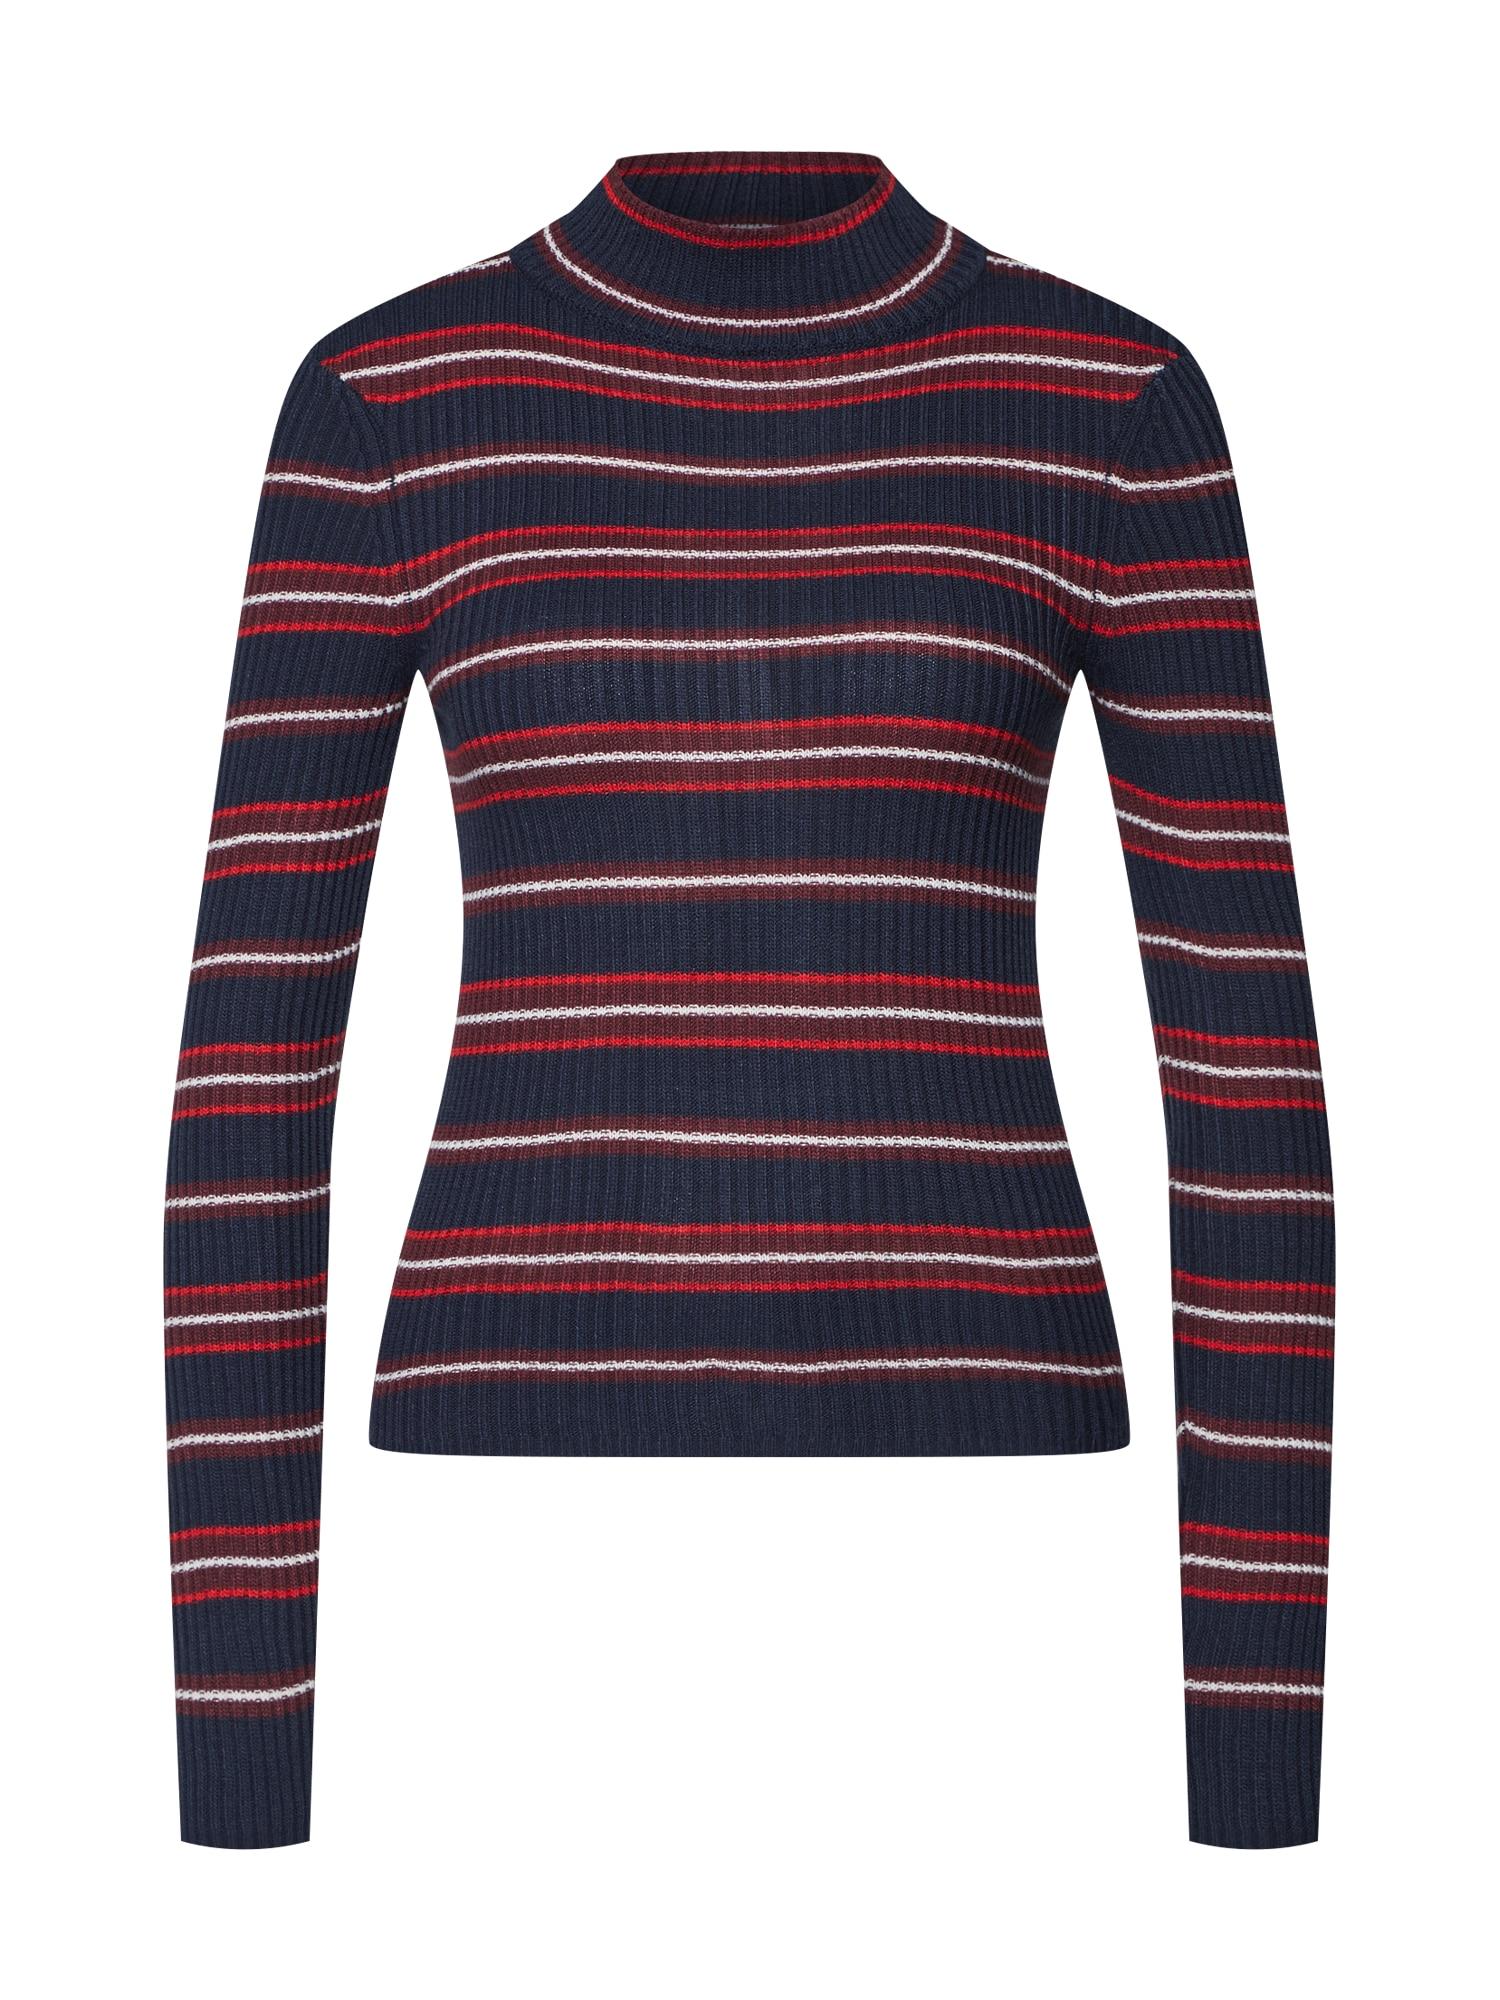 Pullover | Bekleidung > Pullover > Sonstige Pullover | Weiß | Noisy May